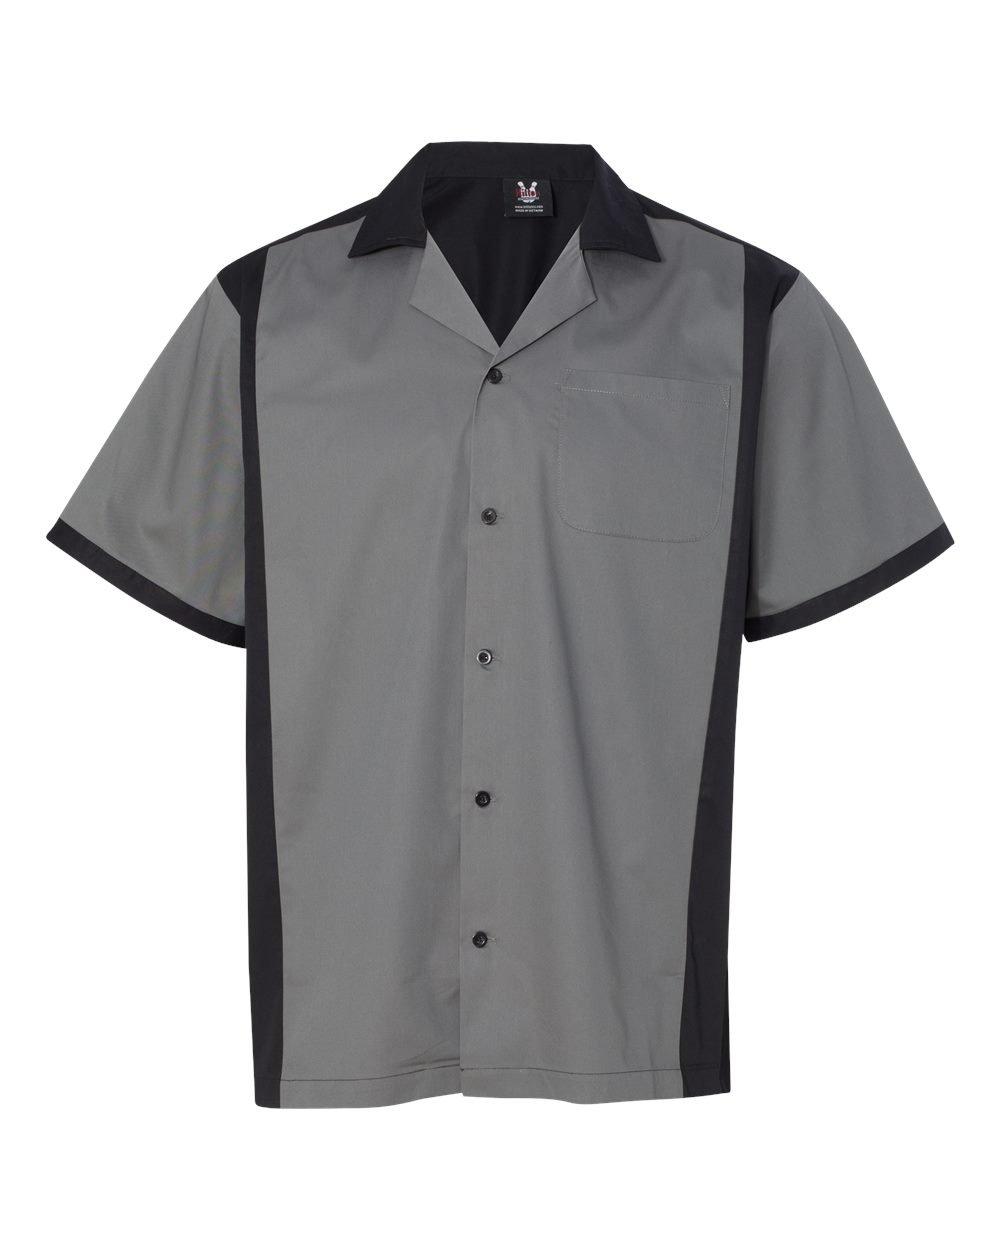 Hilton HP2243 - Cruiser Bowling Shirt Steel by Hilton